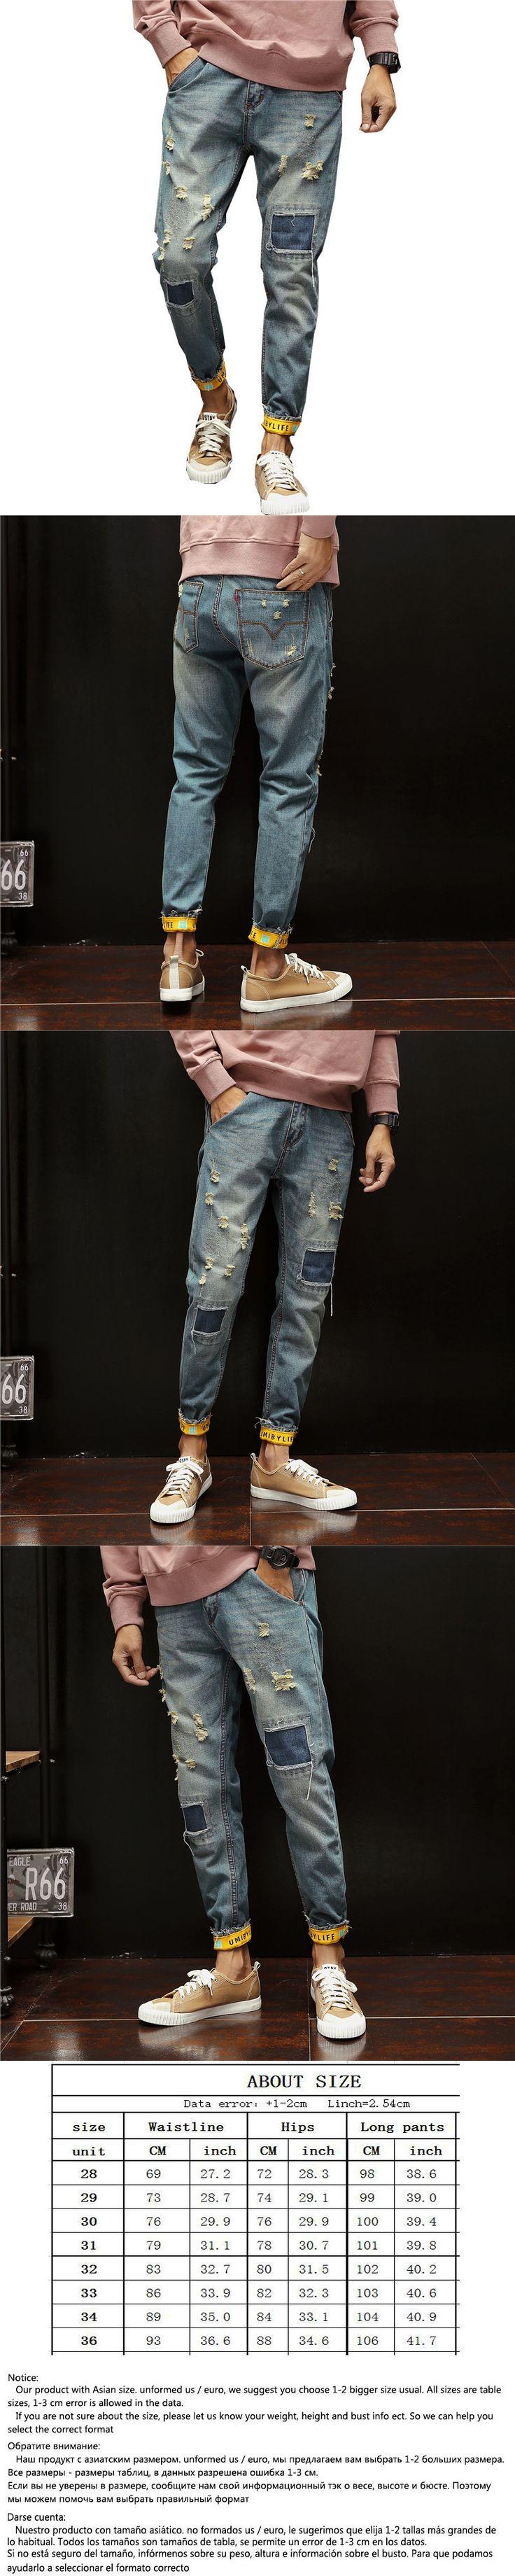 Size 28-36 Slim Fit Ripped Hole Harem Jeans Men'S Oversized Light Blue Length Hip-Hop